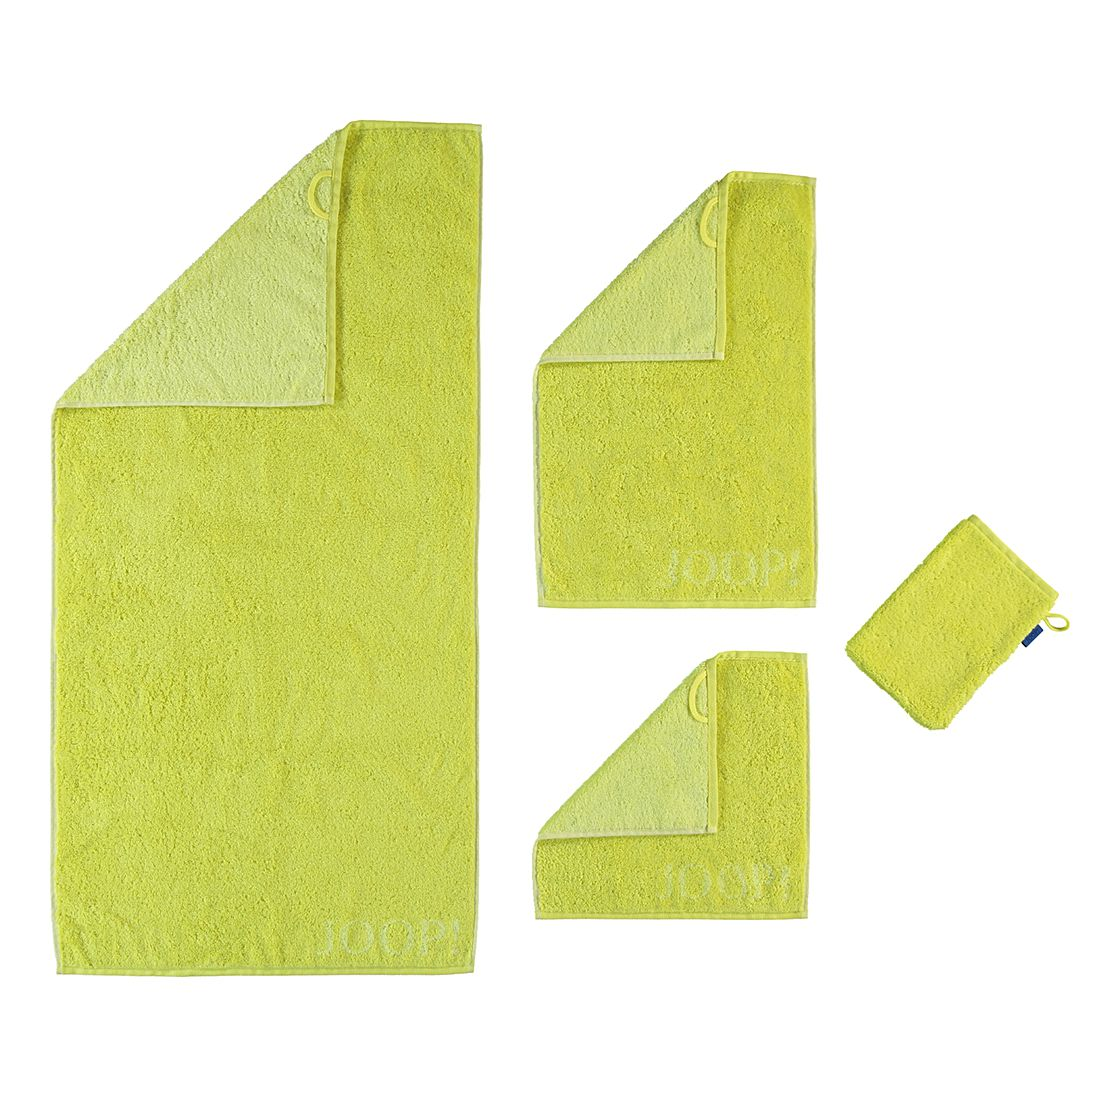 Handtücher Plaza Doubleface 1631 – Baumwolle – Limone – Gästetuch 30×50 cm, Joop günstig